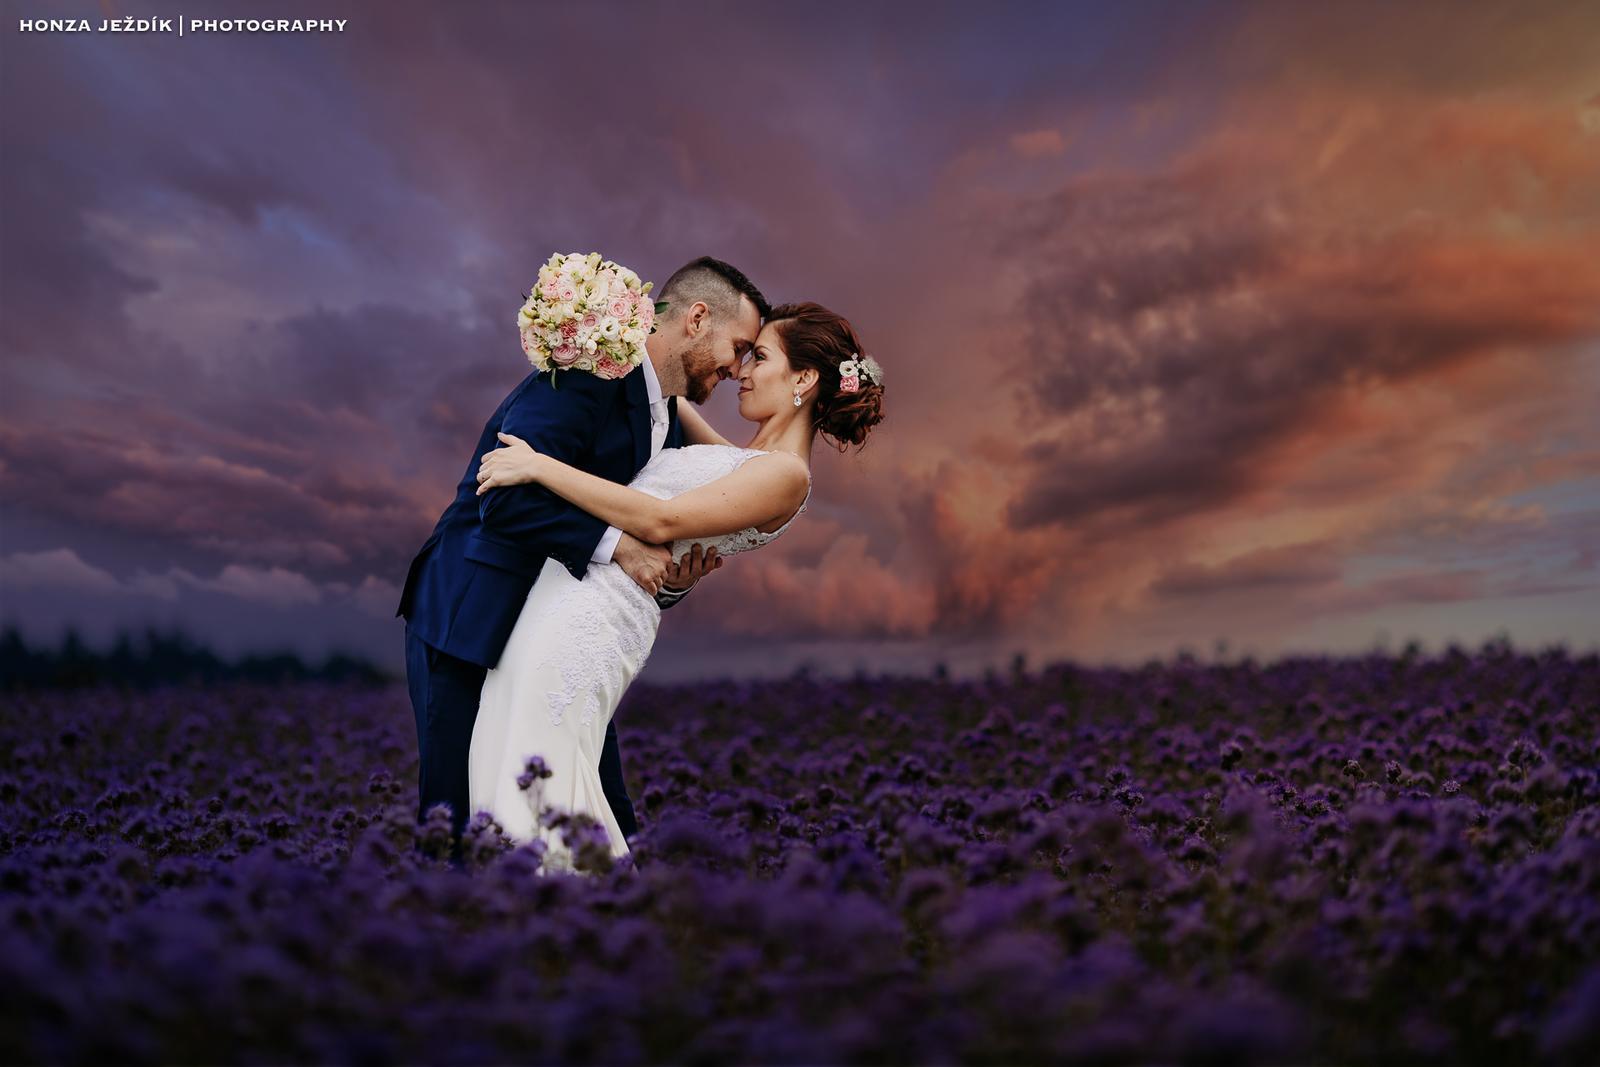 honzajezdik_photography - Obrázek č. 6